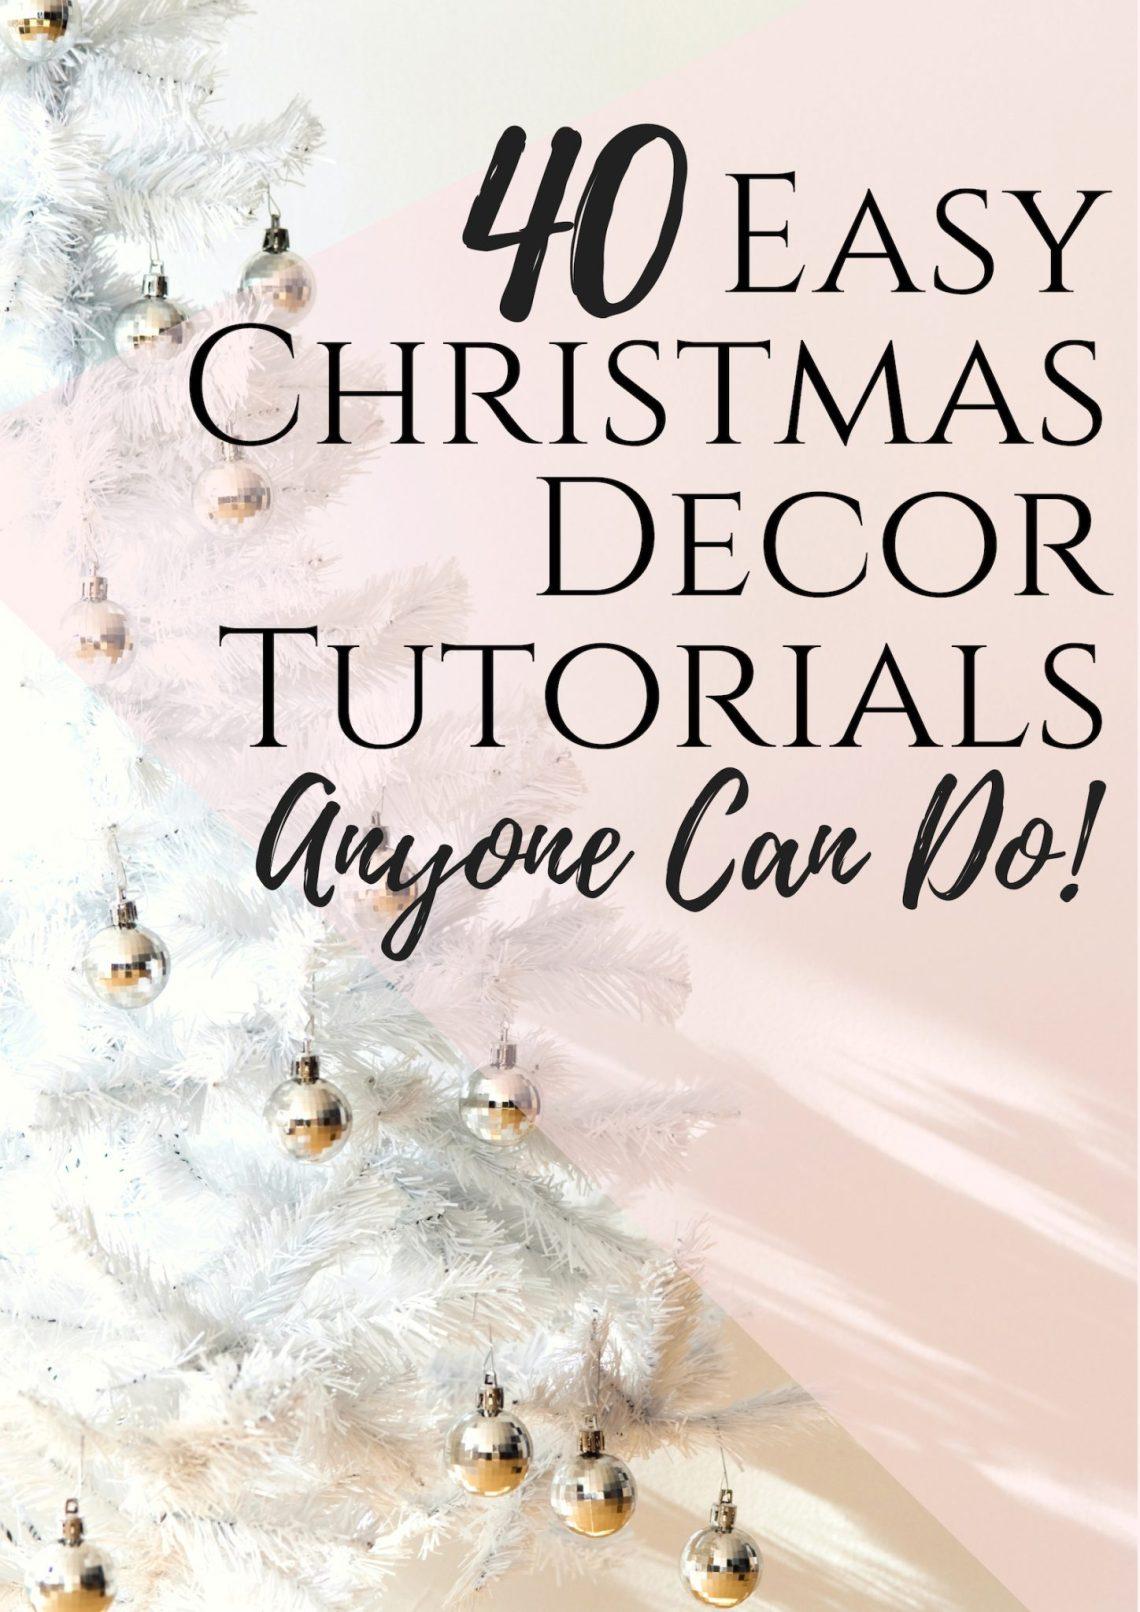 40 easy Christmas home decor tutorials anyone can do